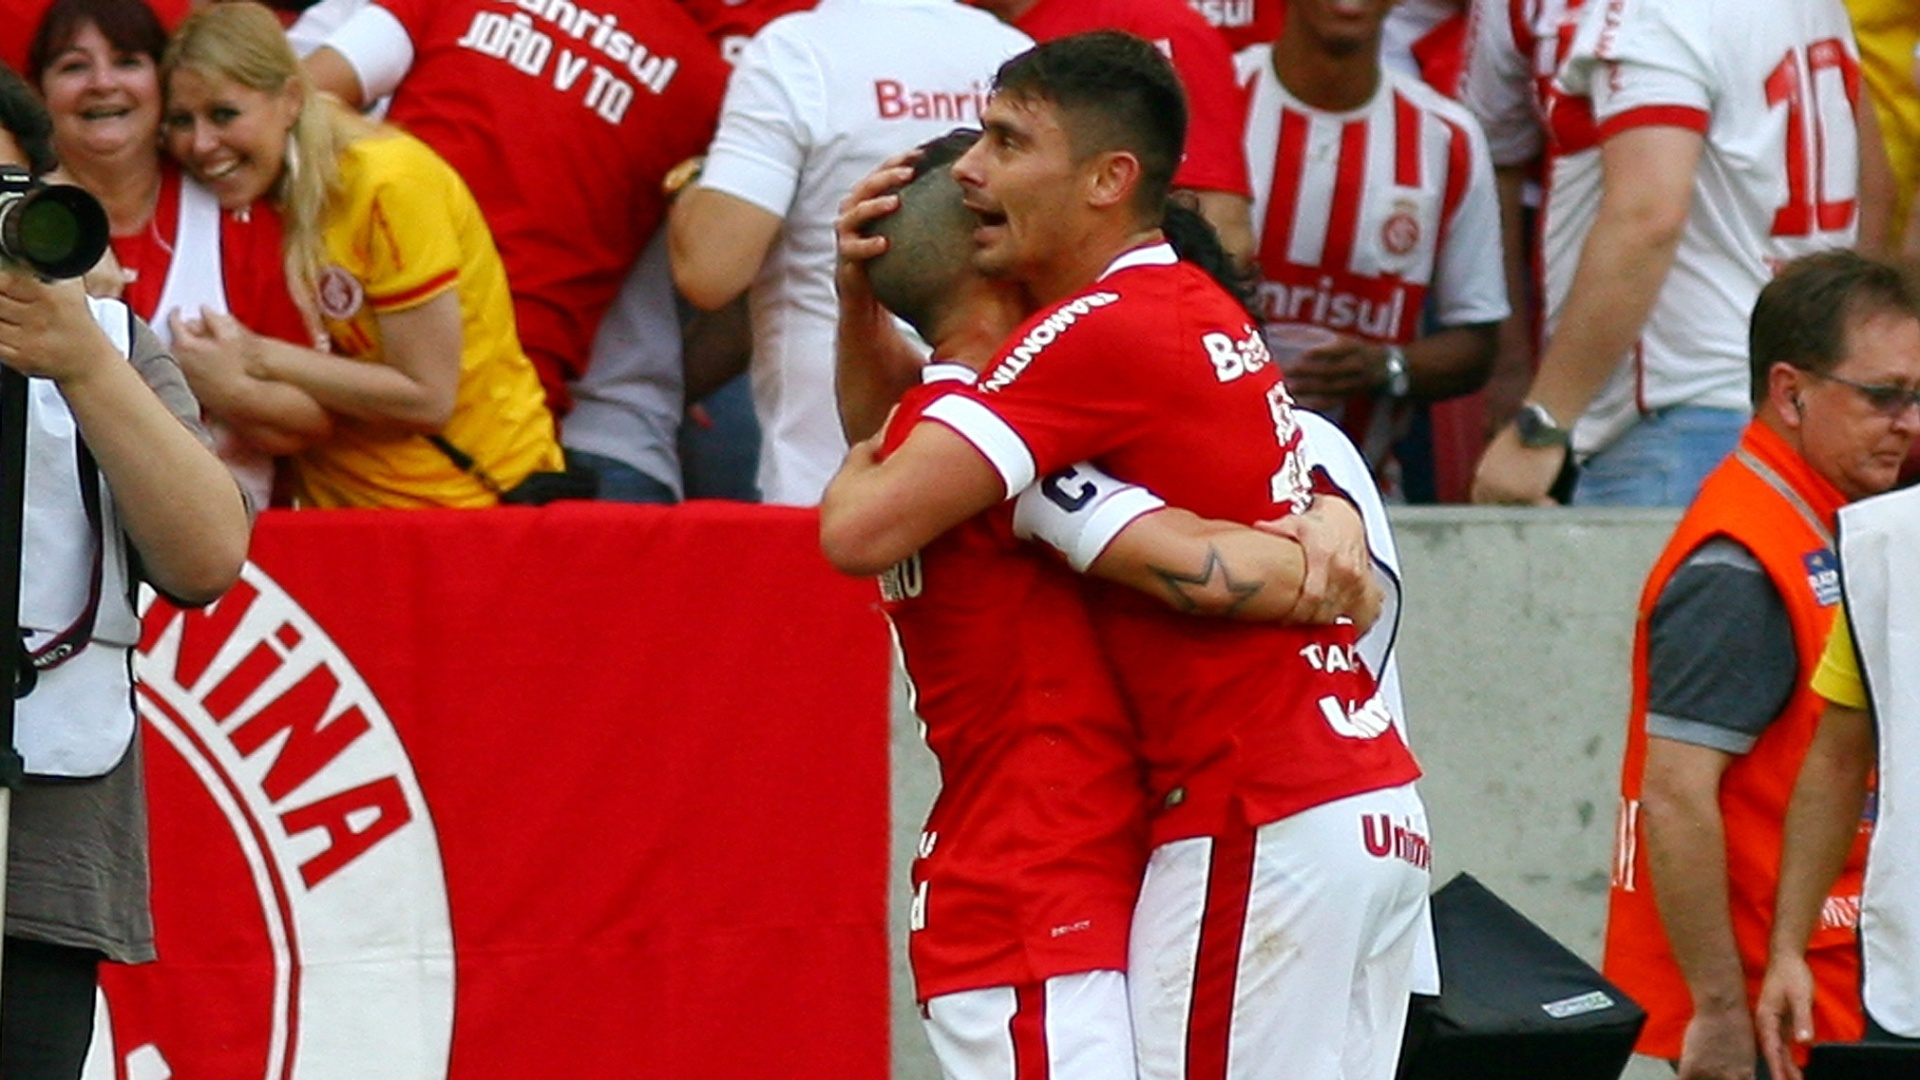 Alex abraça D'Alessandro após marcar contra o Fluminense